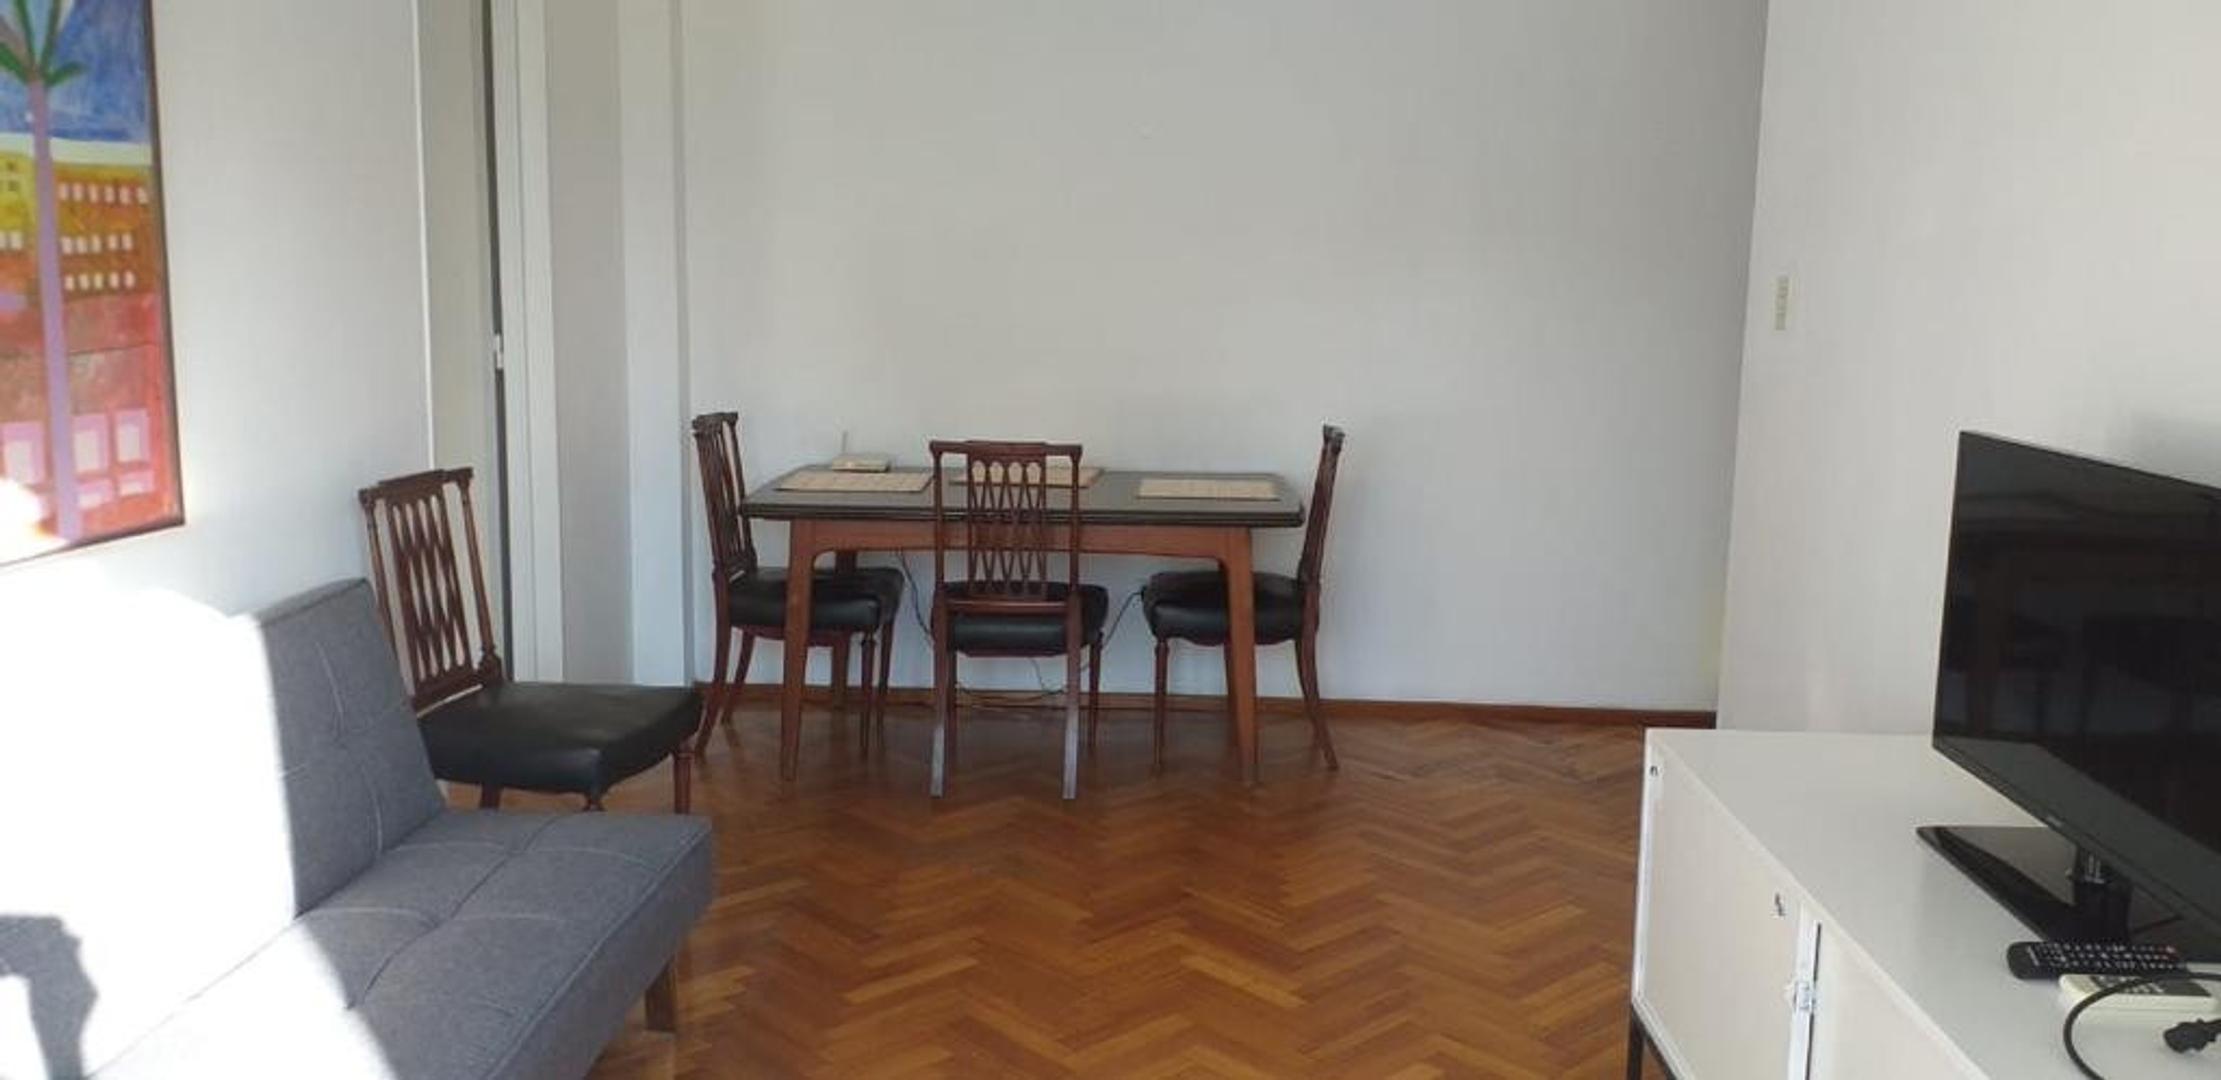 Departamento - 50 m² | 1 dormitorio | Frente